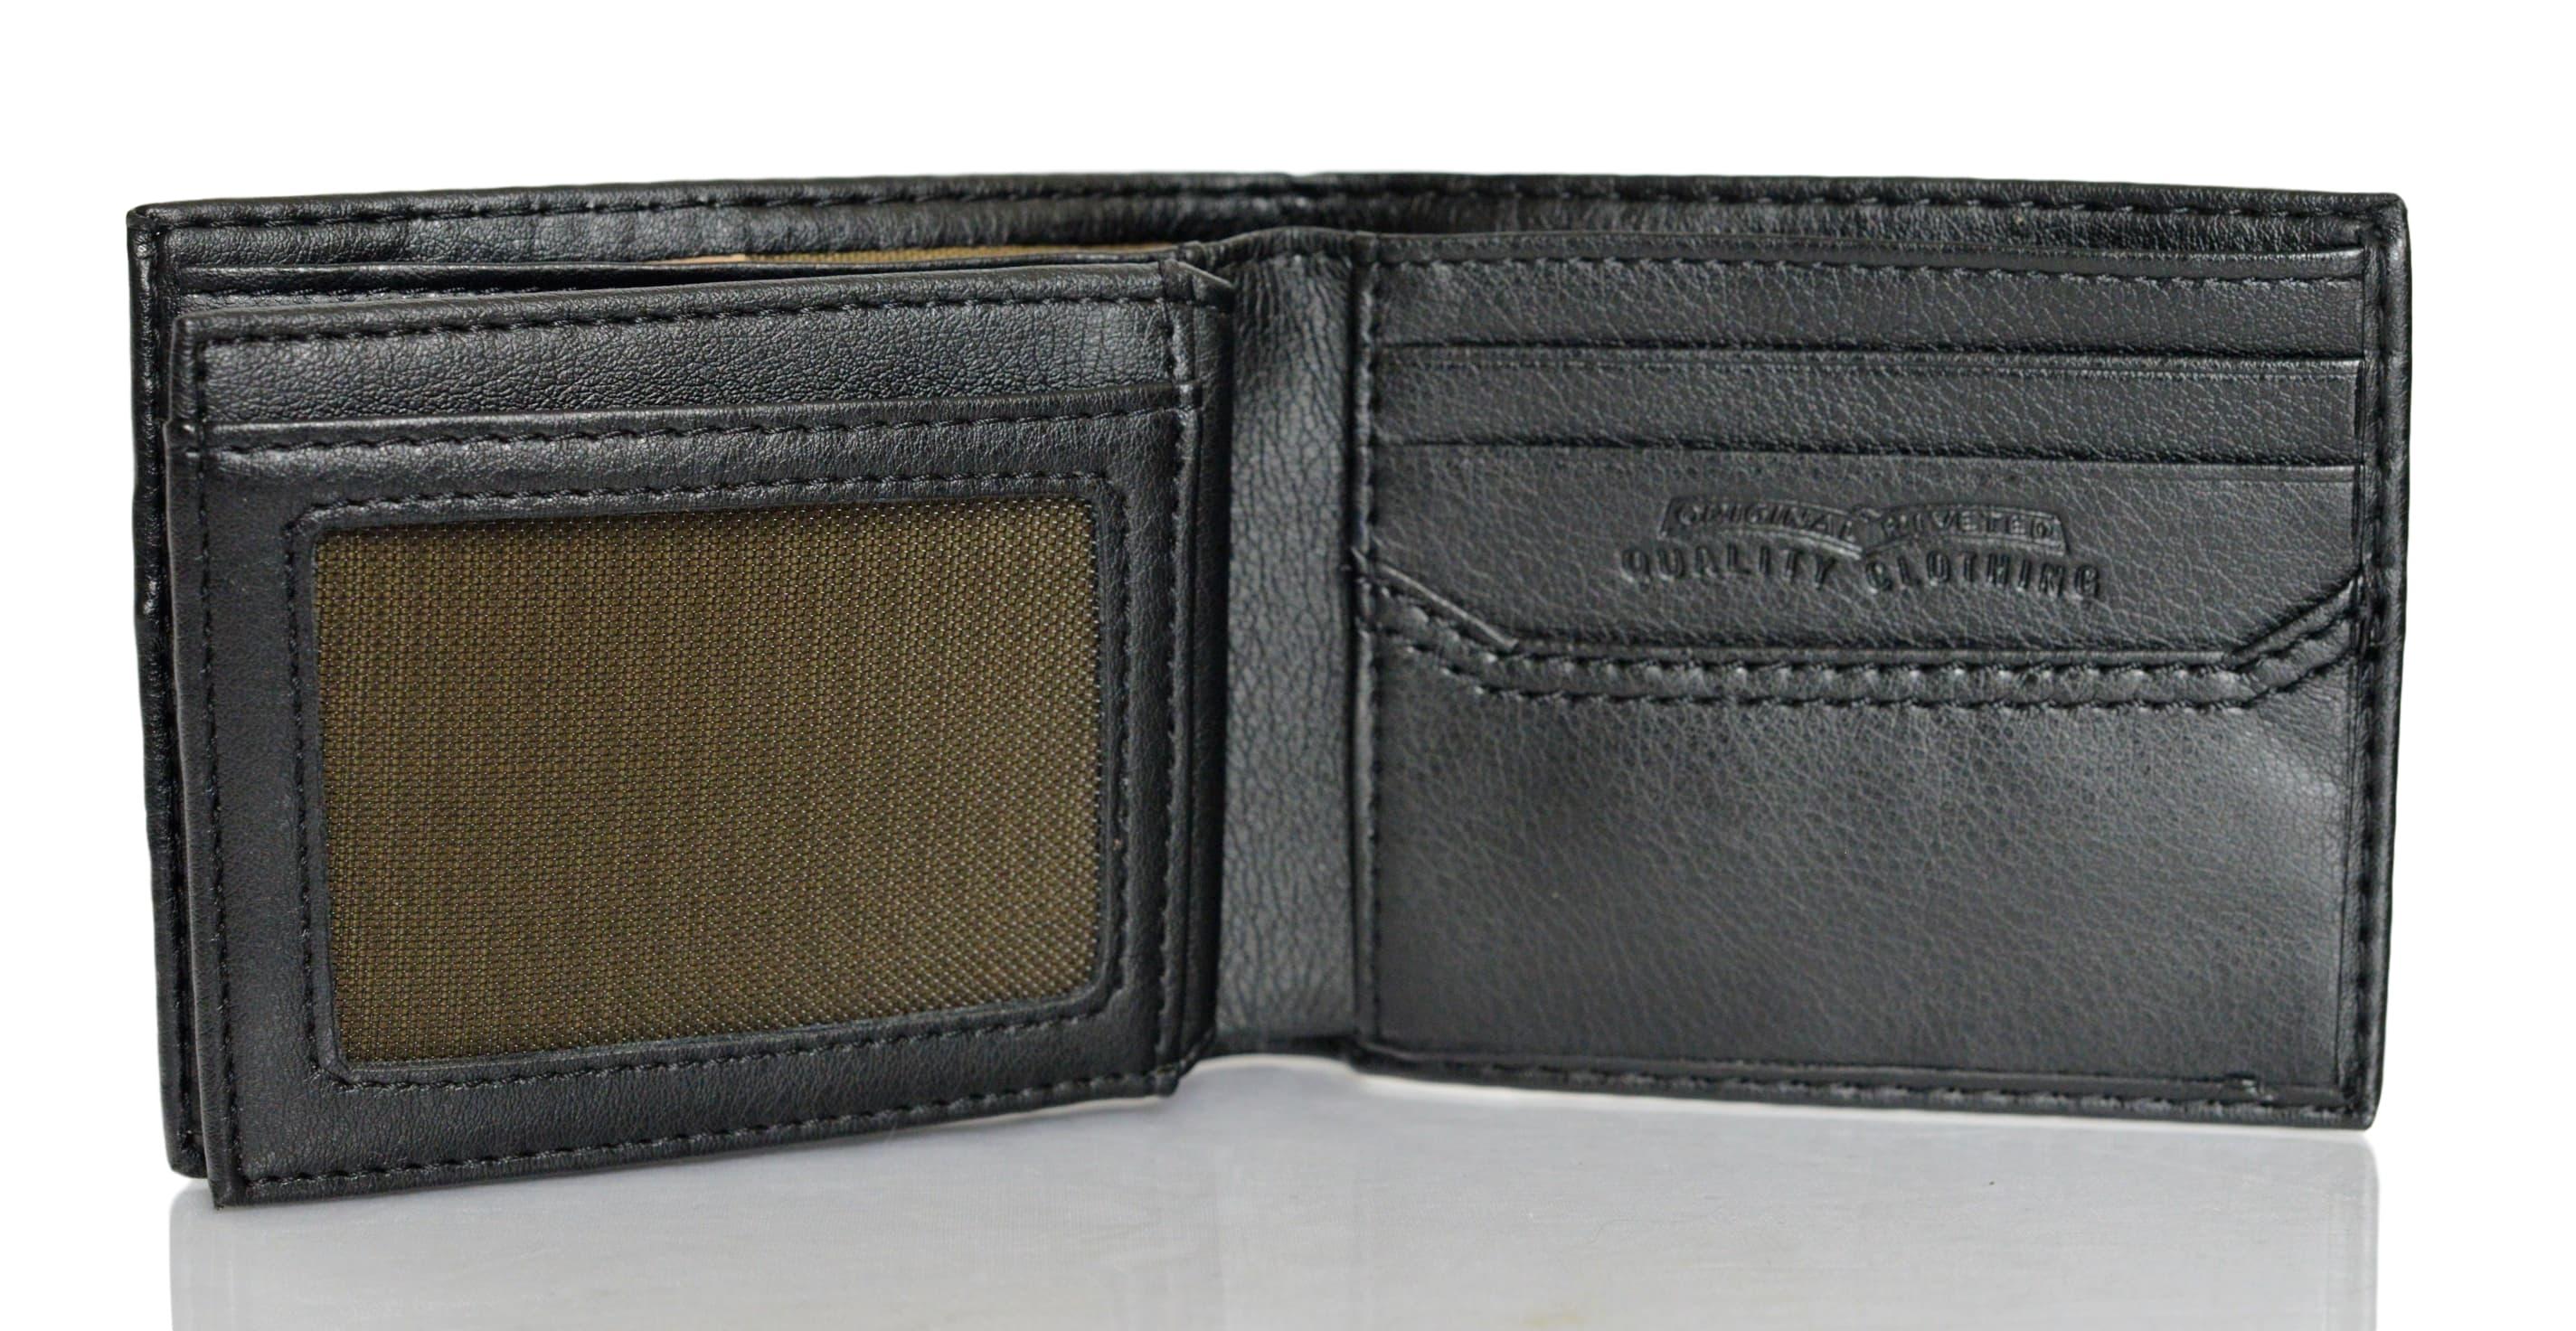 Levi-039-s-X-Capacity-Slim-Men-039-s-Bifold-Leather-Wallet thumbnail 6